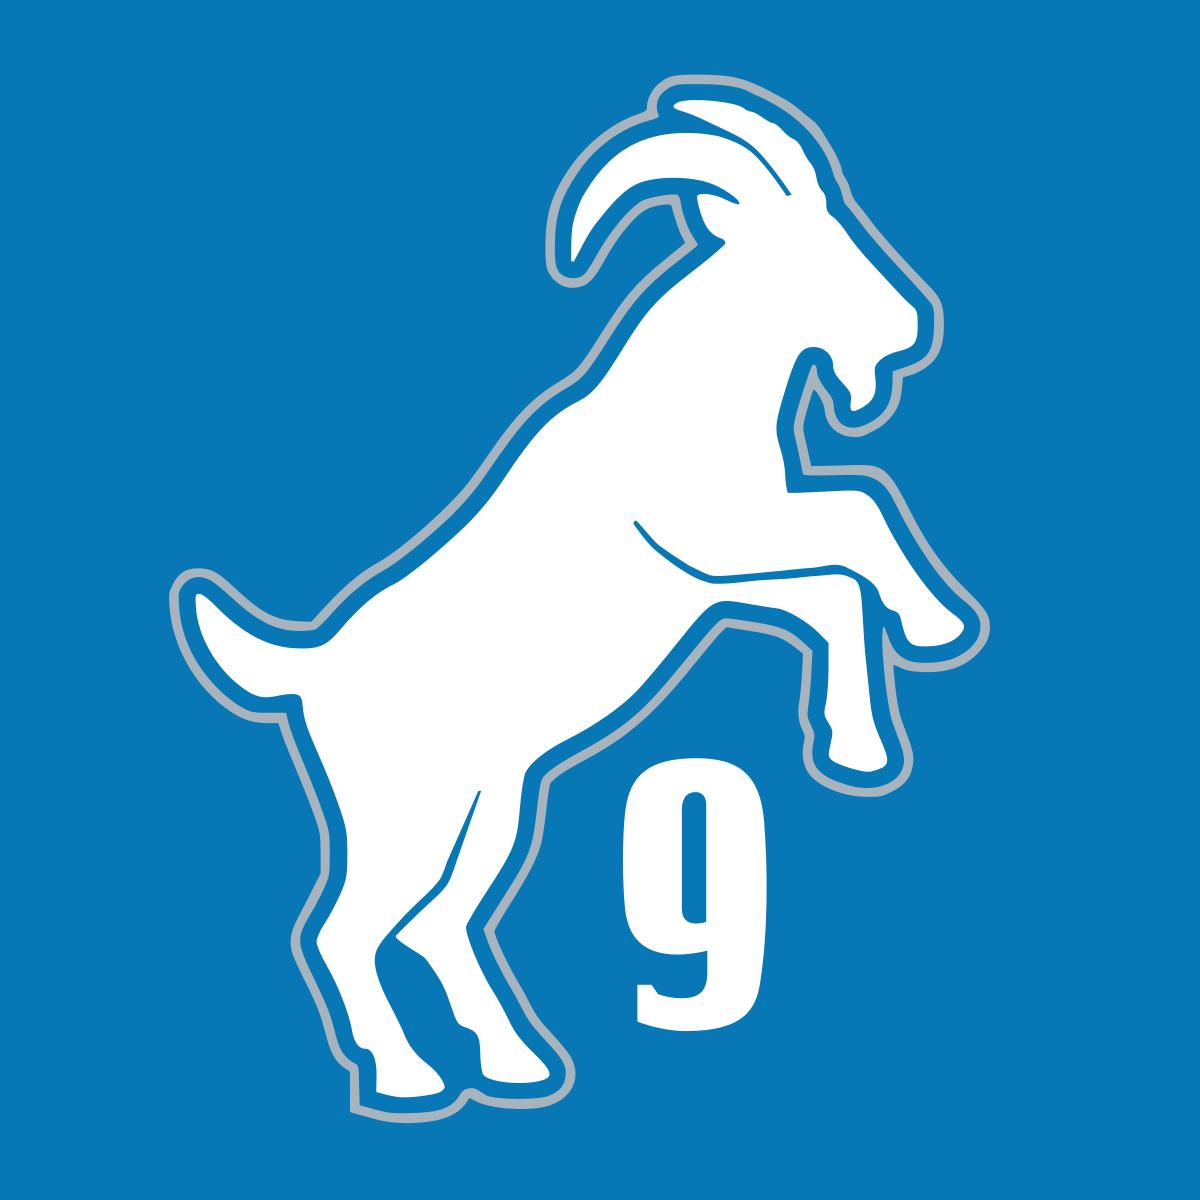 goat logo2.png